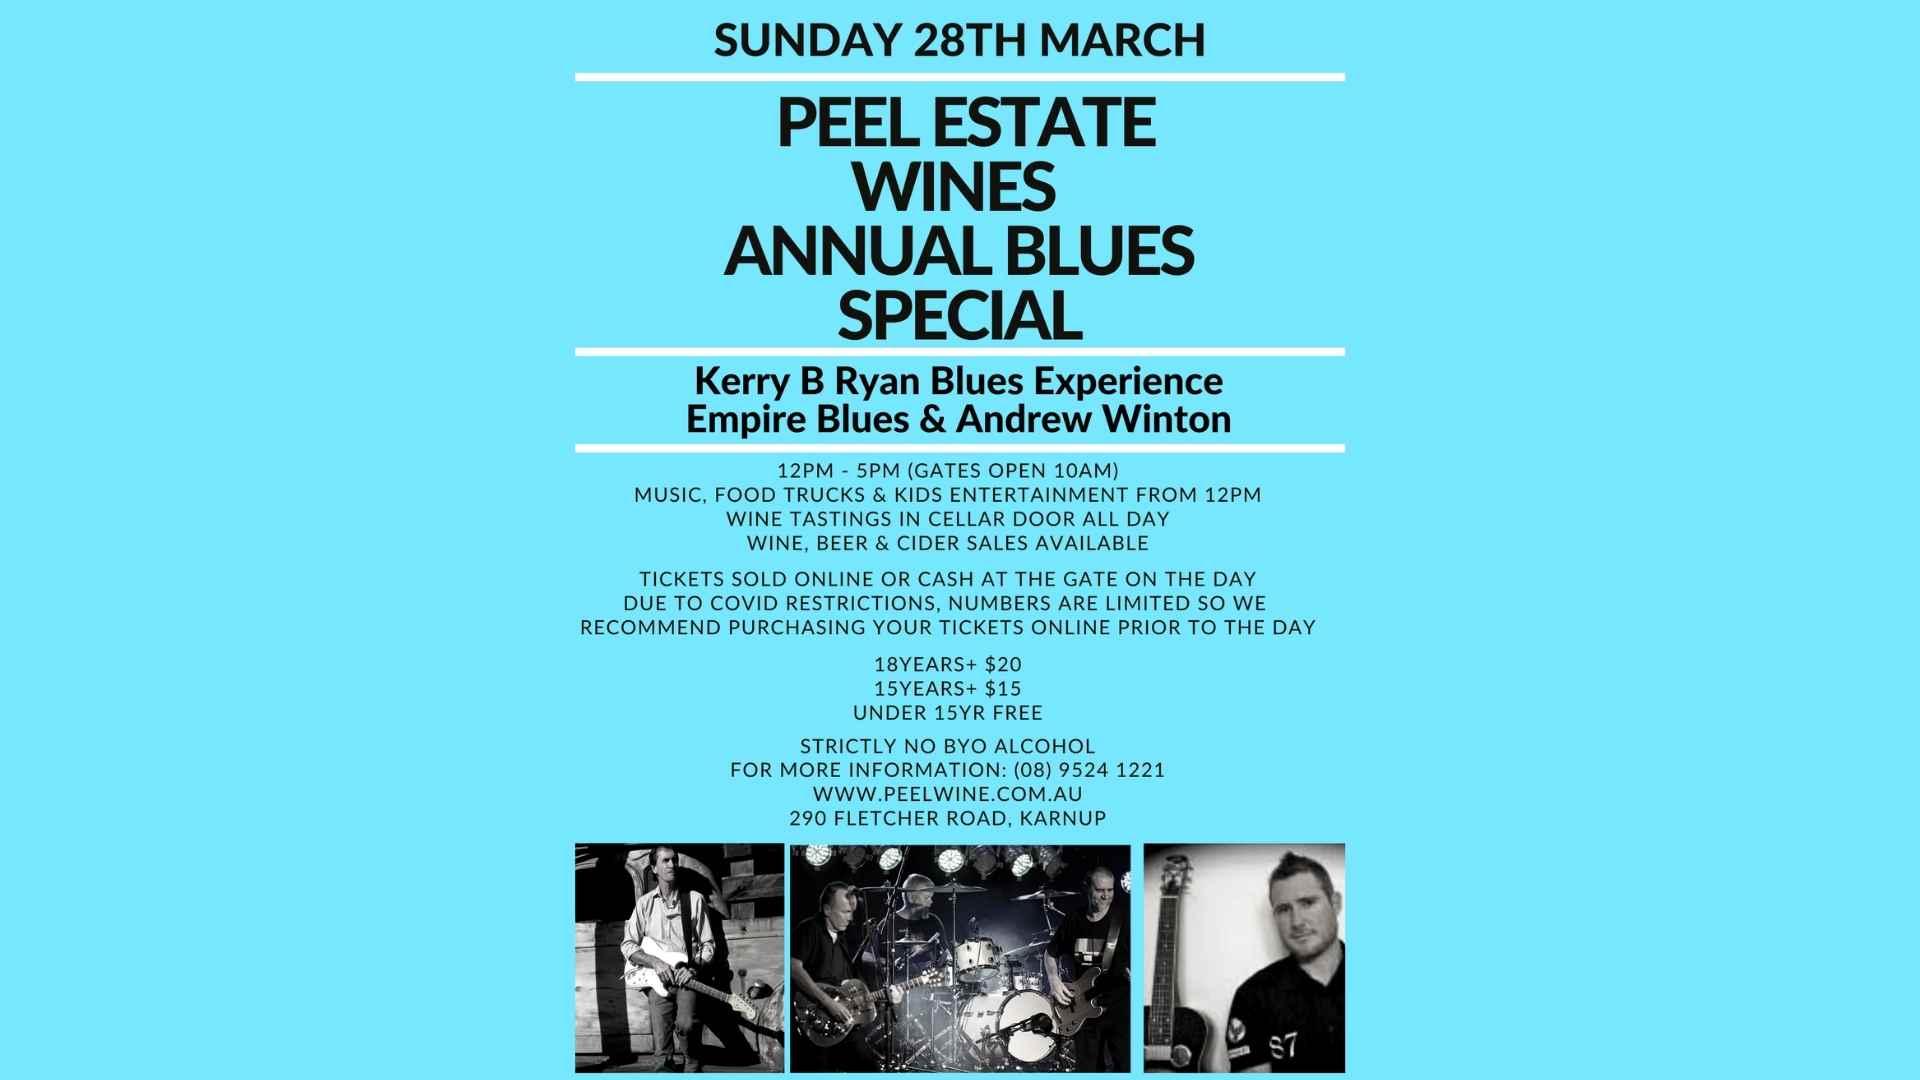 Peel-Estate-Wine-Annual-Blues-Special